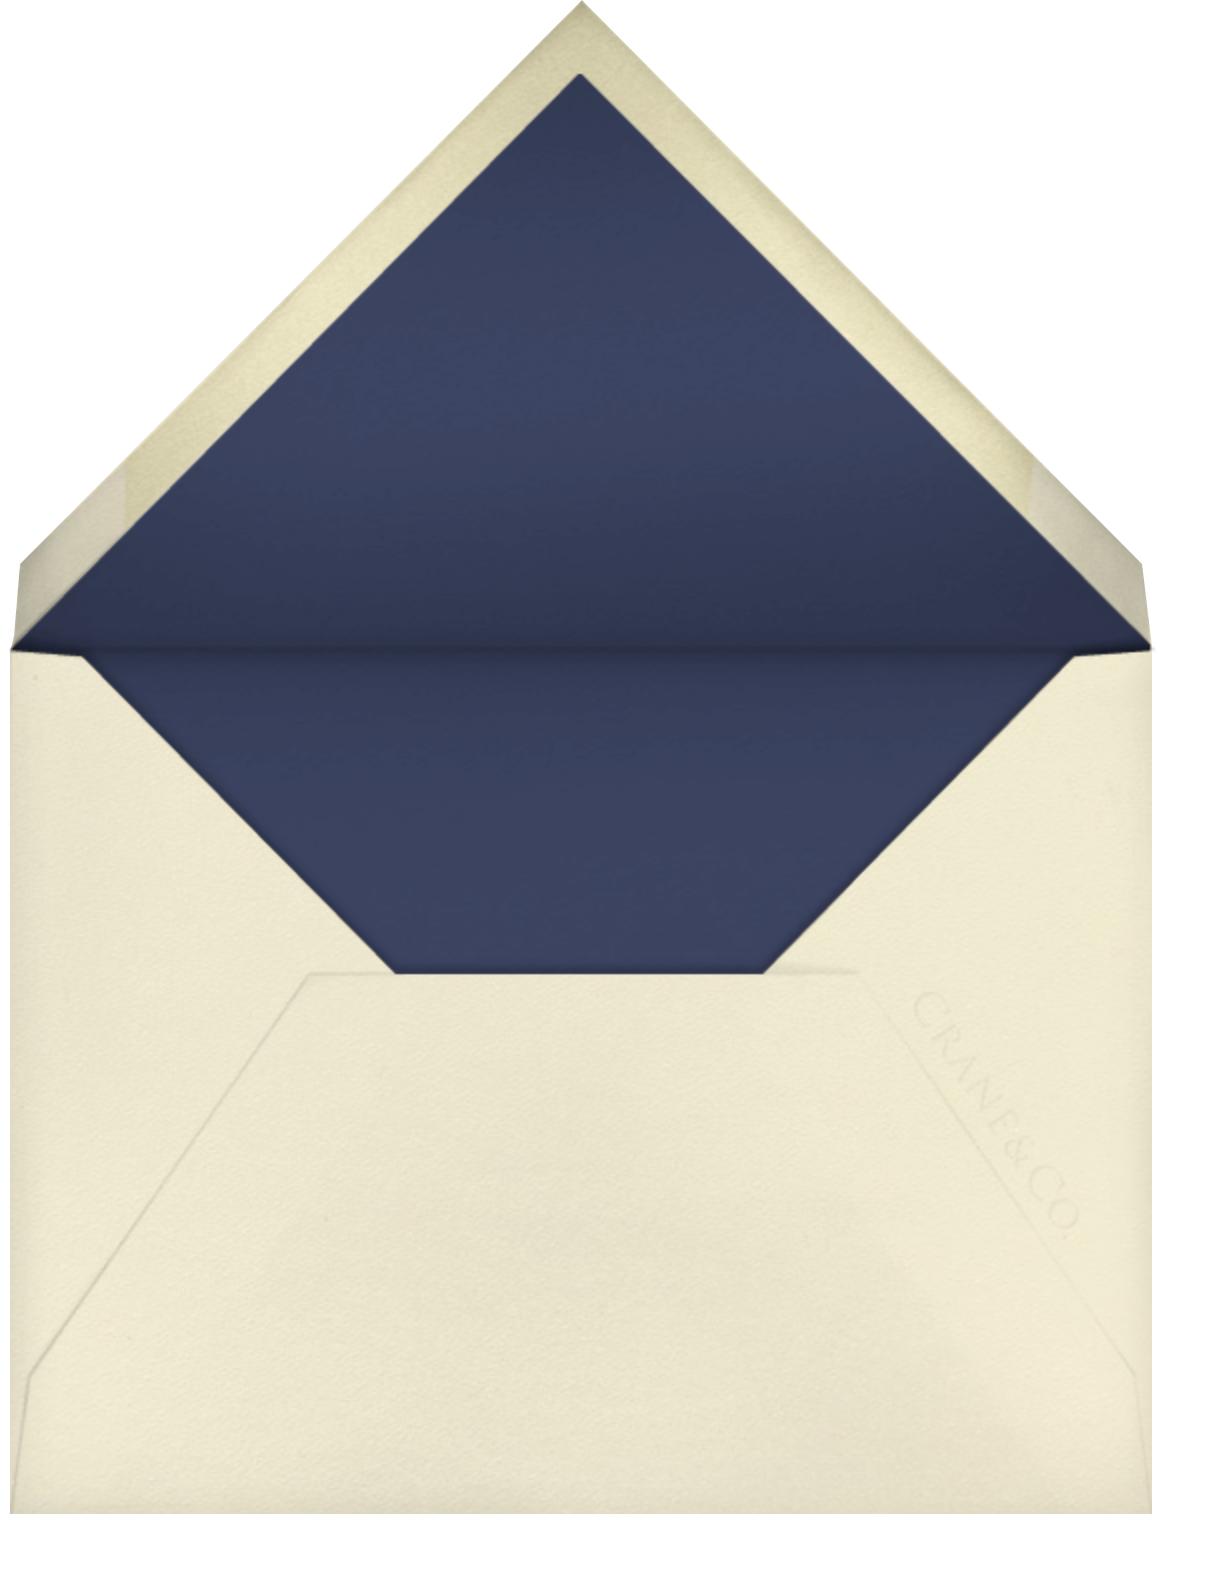 Nautical I - kate spade new york - All - envelope back